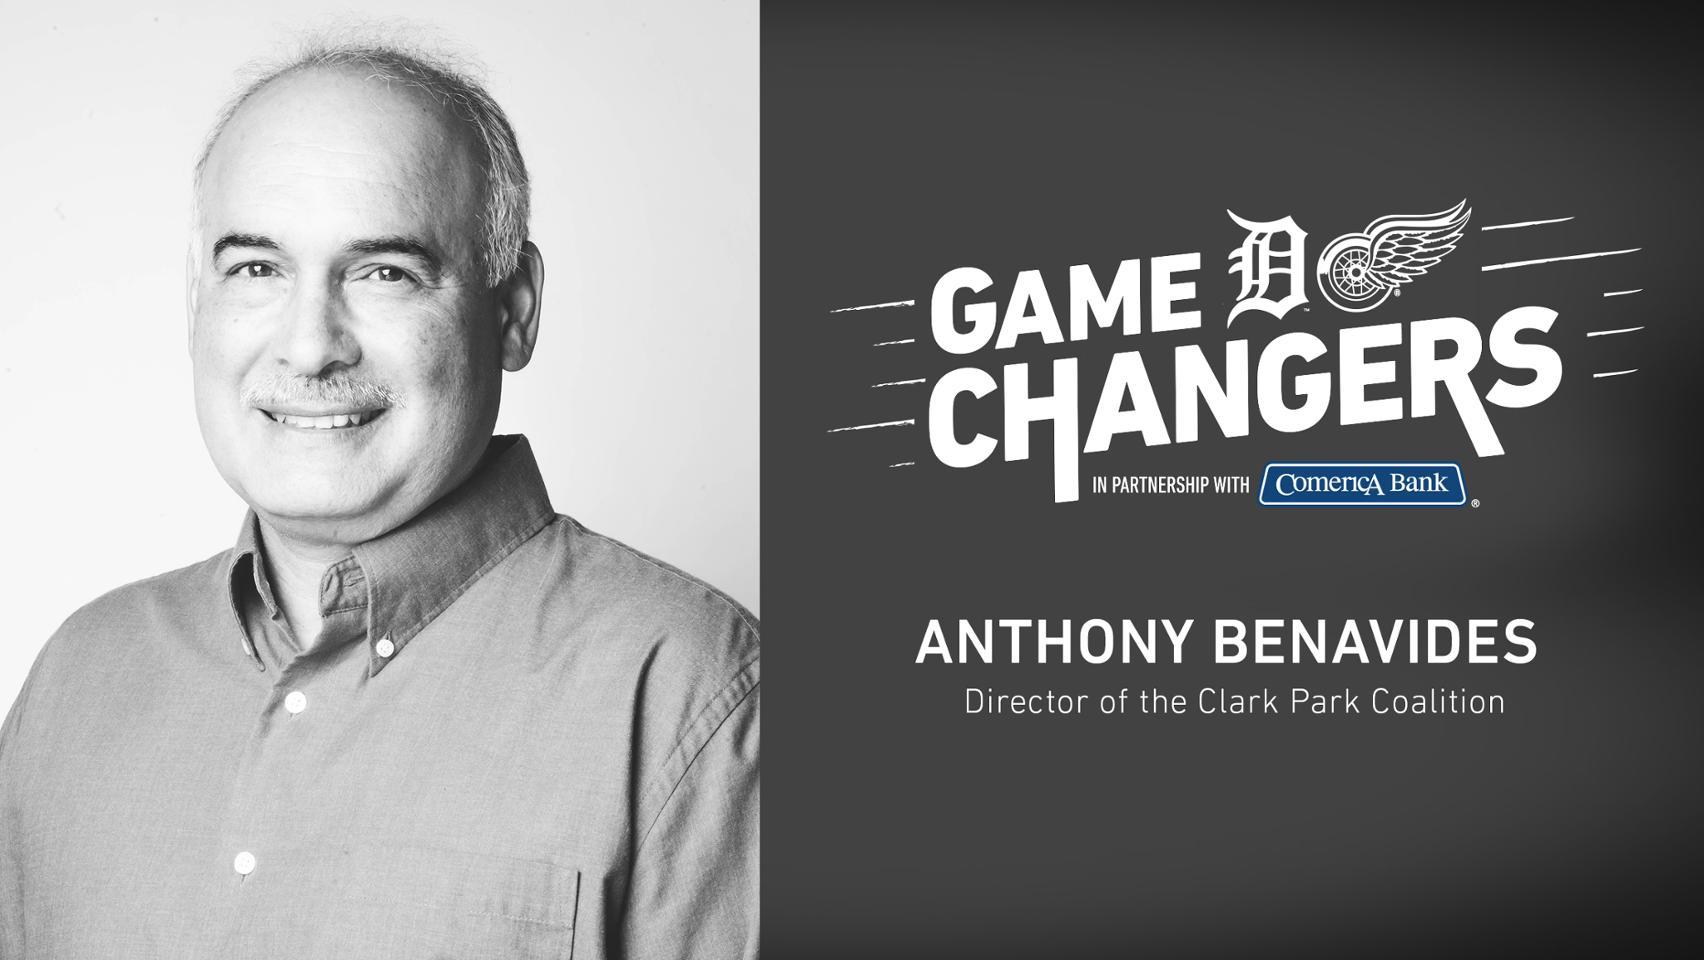 Anthony Benavides